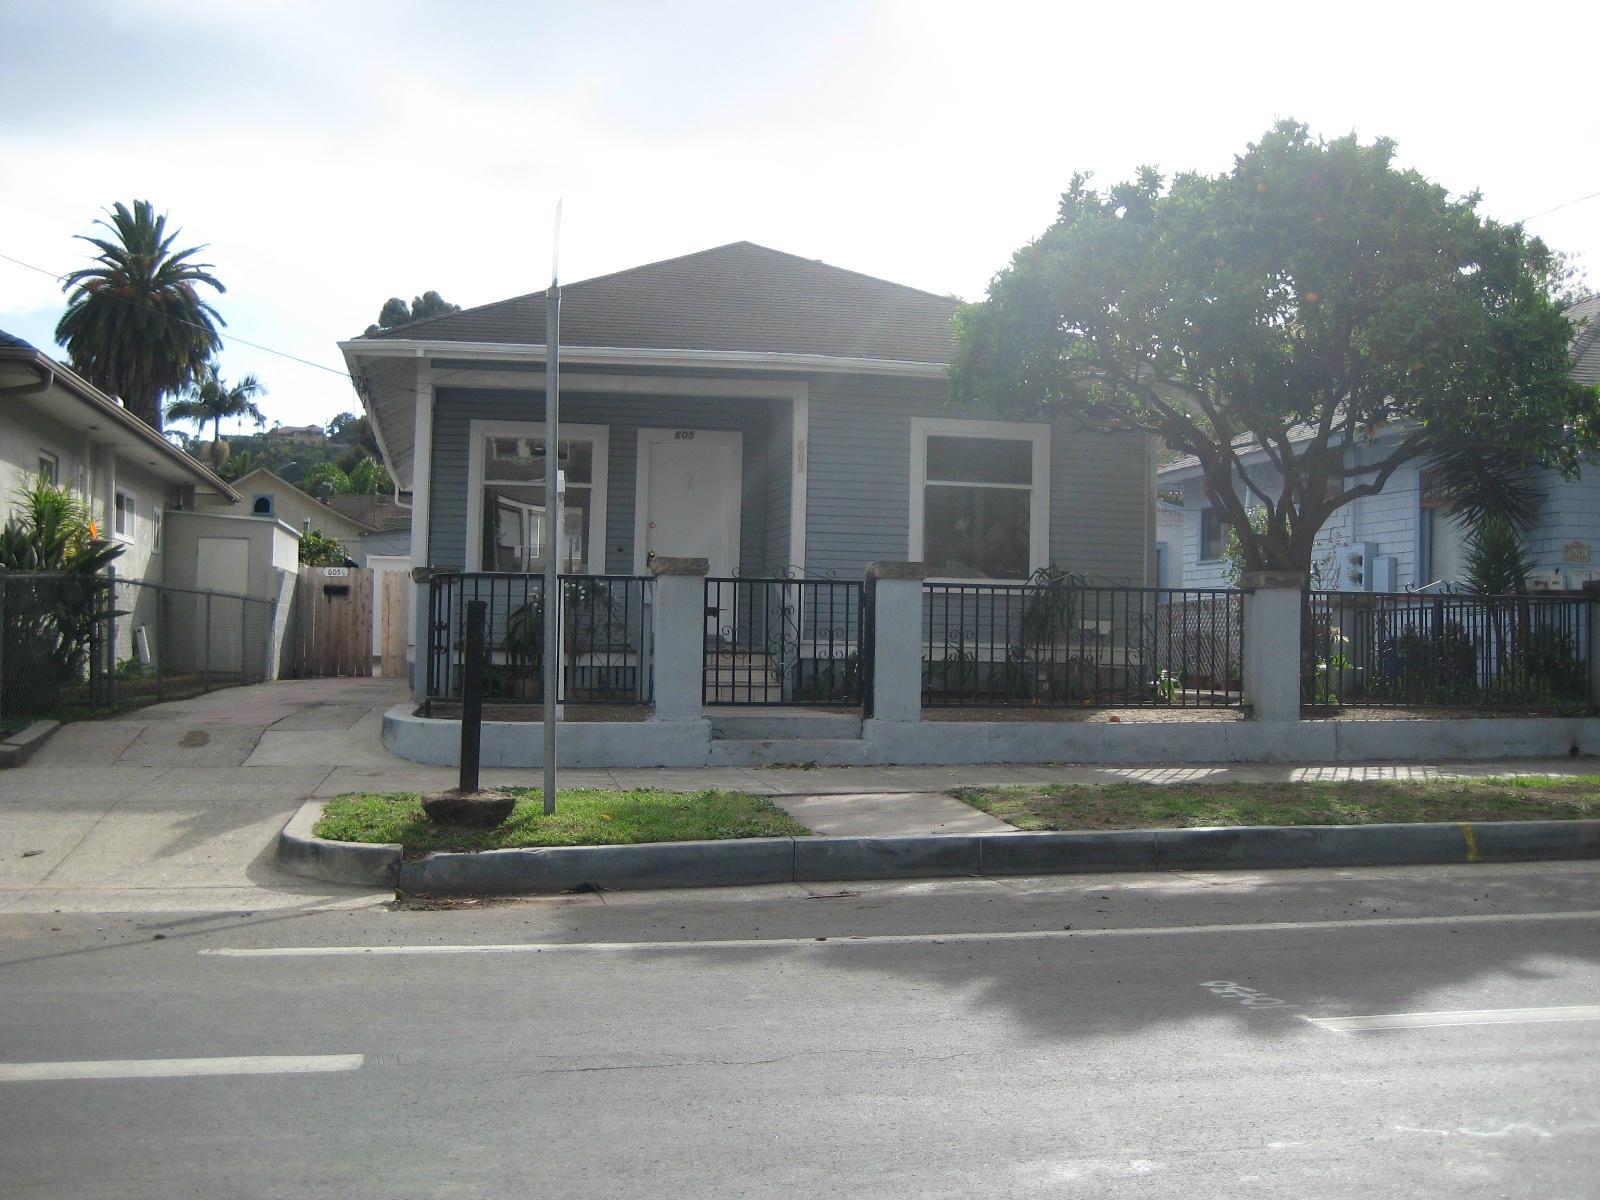 Property photo for 605 Castillo St Santa Barbara, California 93101 - 14-918